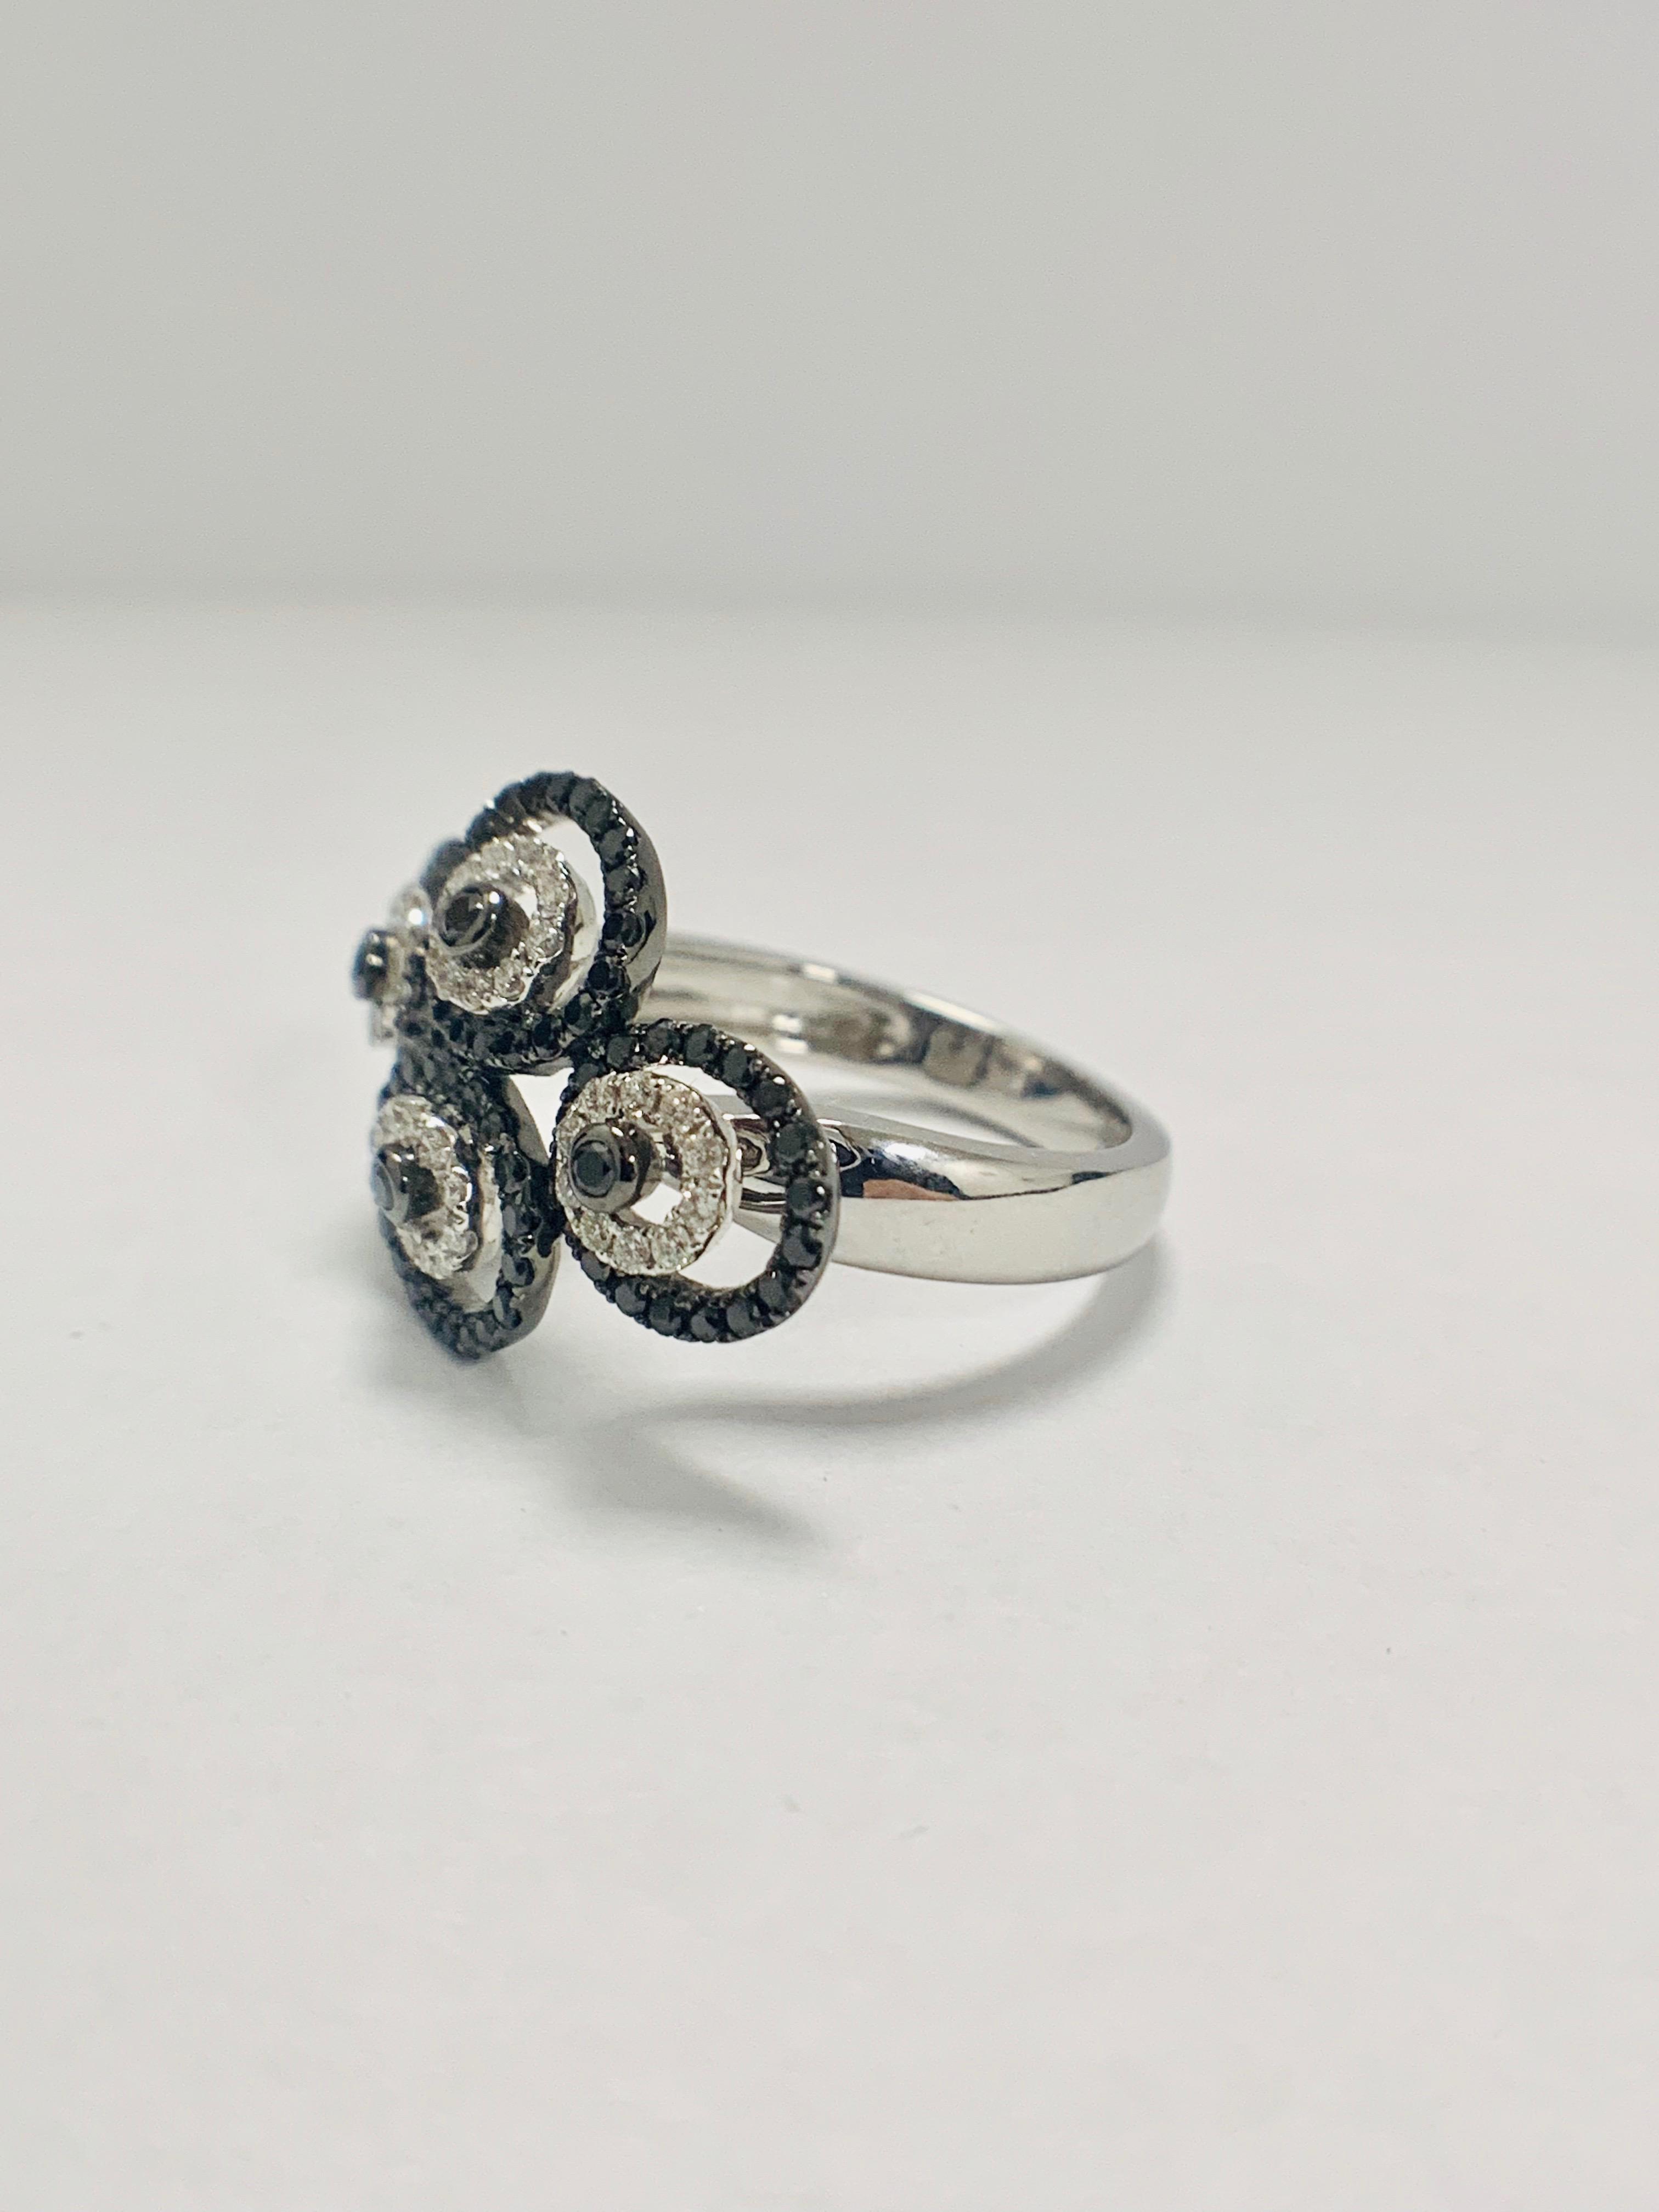 18ct White Gold Diamond ring featuring 80 round cut, black Diamonds (0.61ct TBDW) - Image 9 of 12